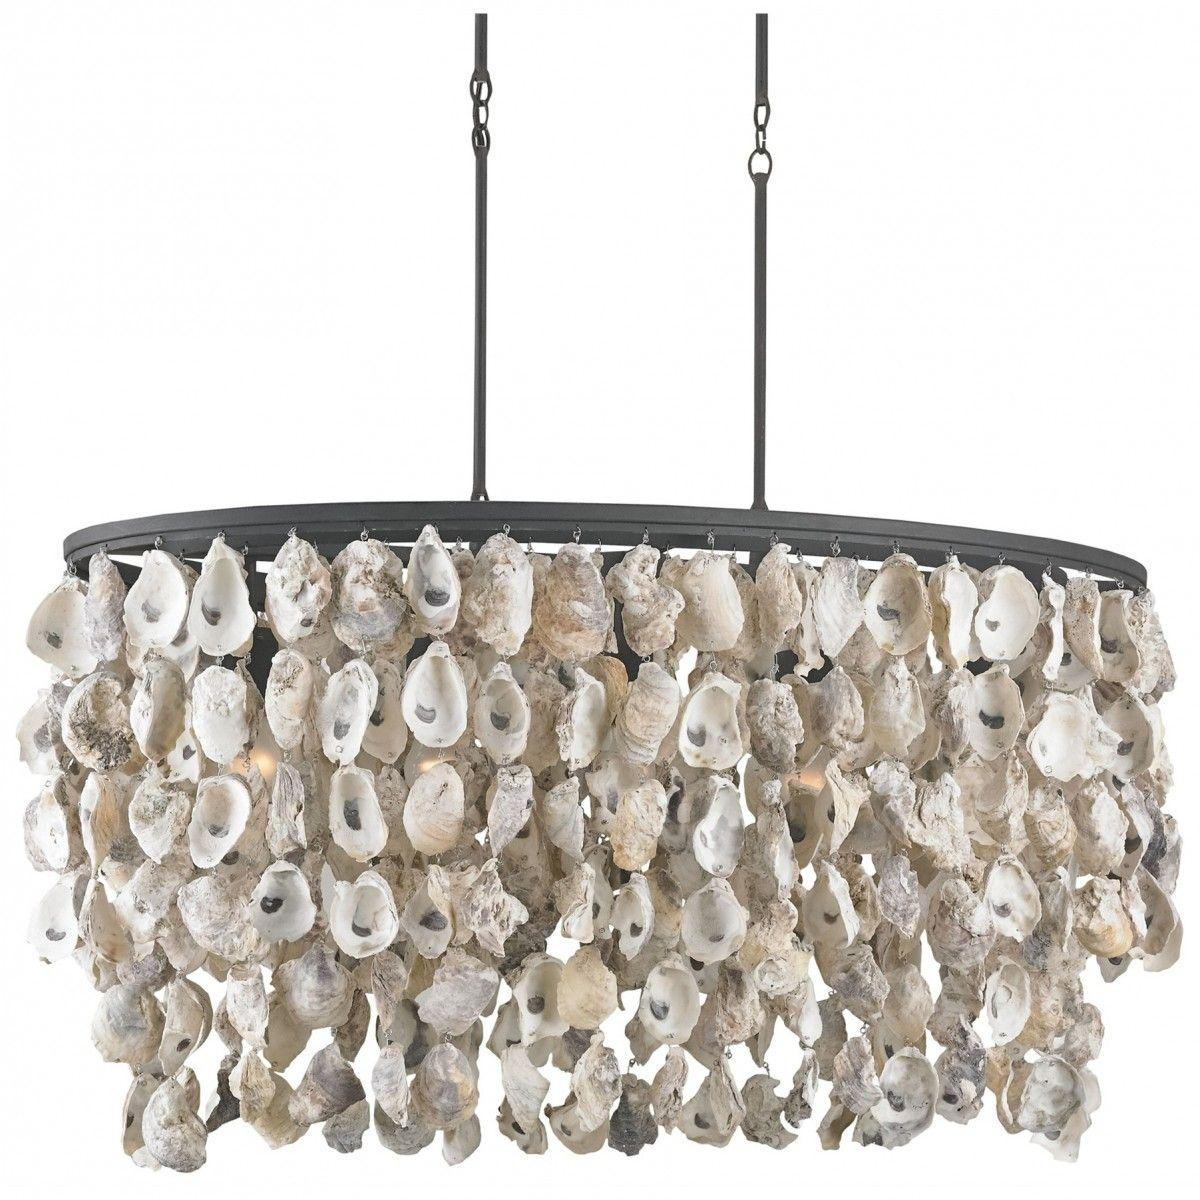 Currey and company stillwater chandelier linear chandeliers currey and company stillwater chandelier linear chandeliers lighting candelabra inc arubaitofo Gallery